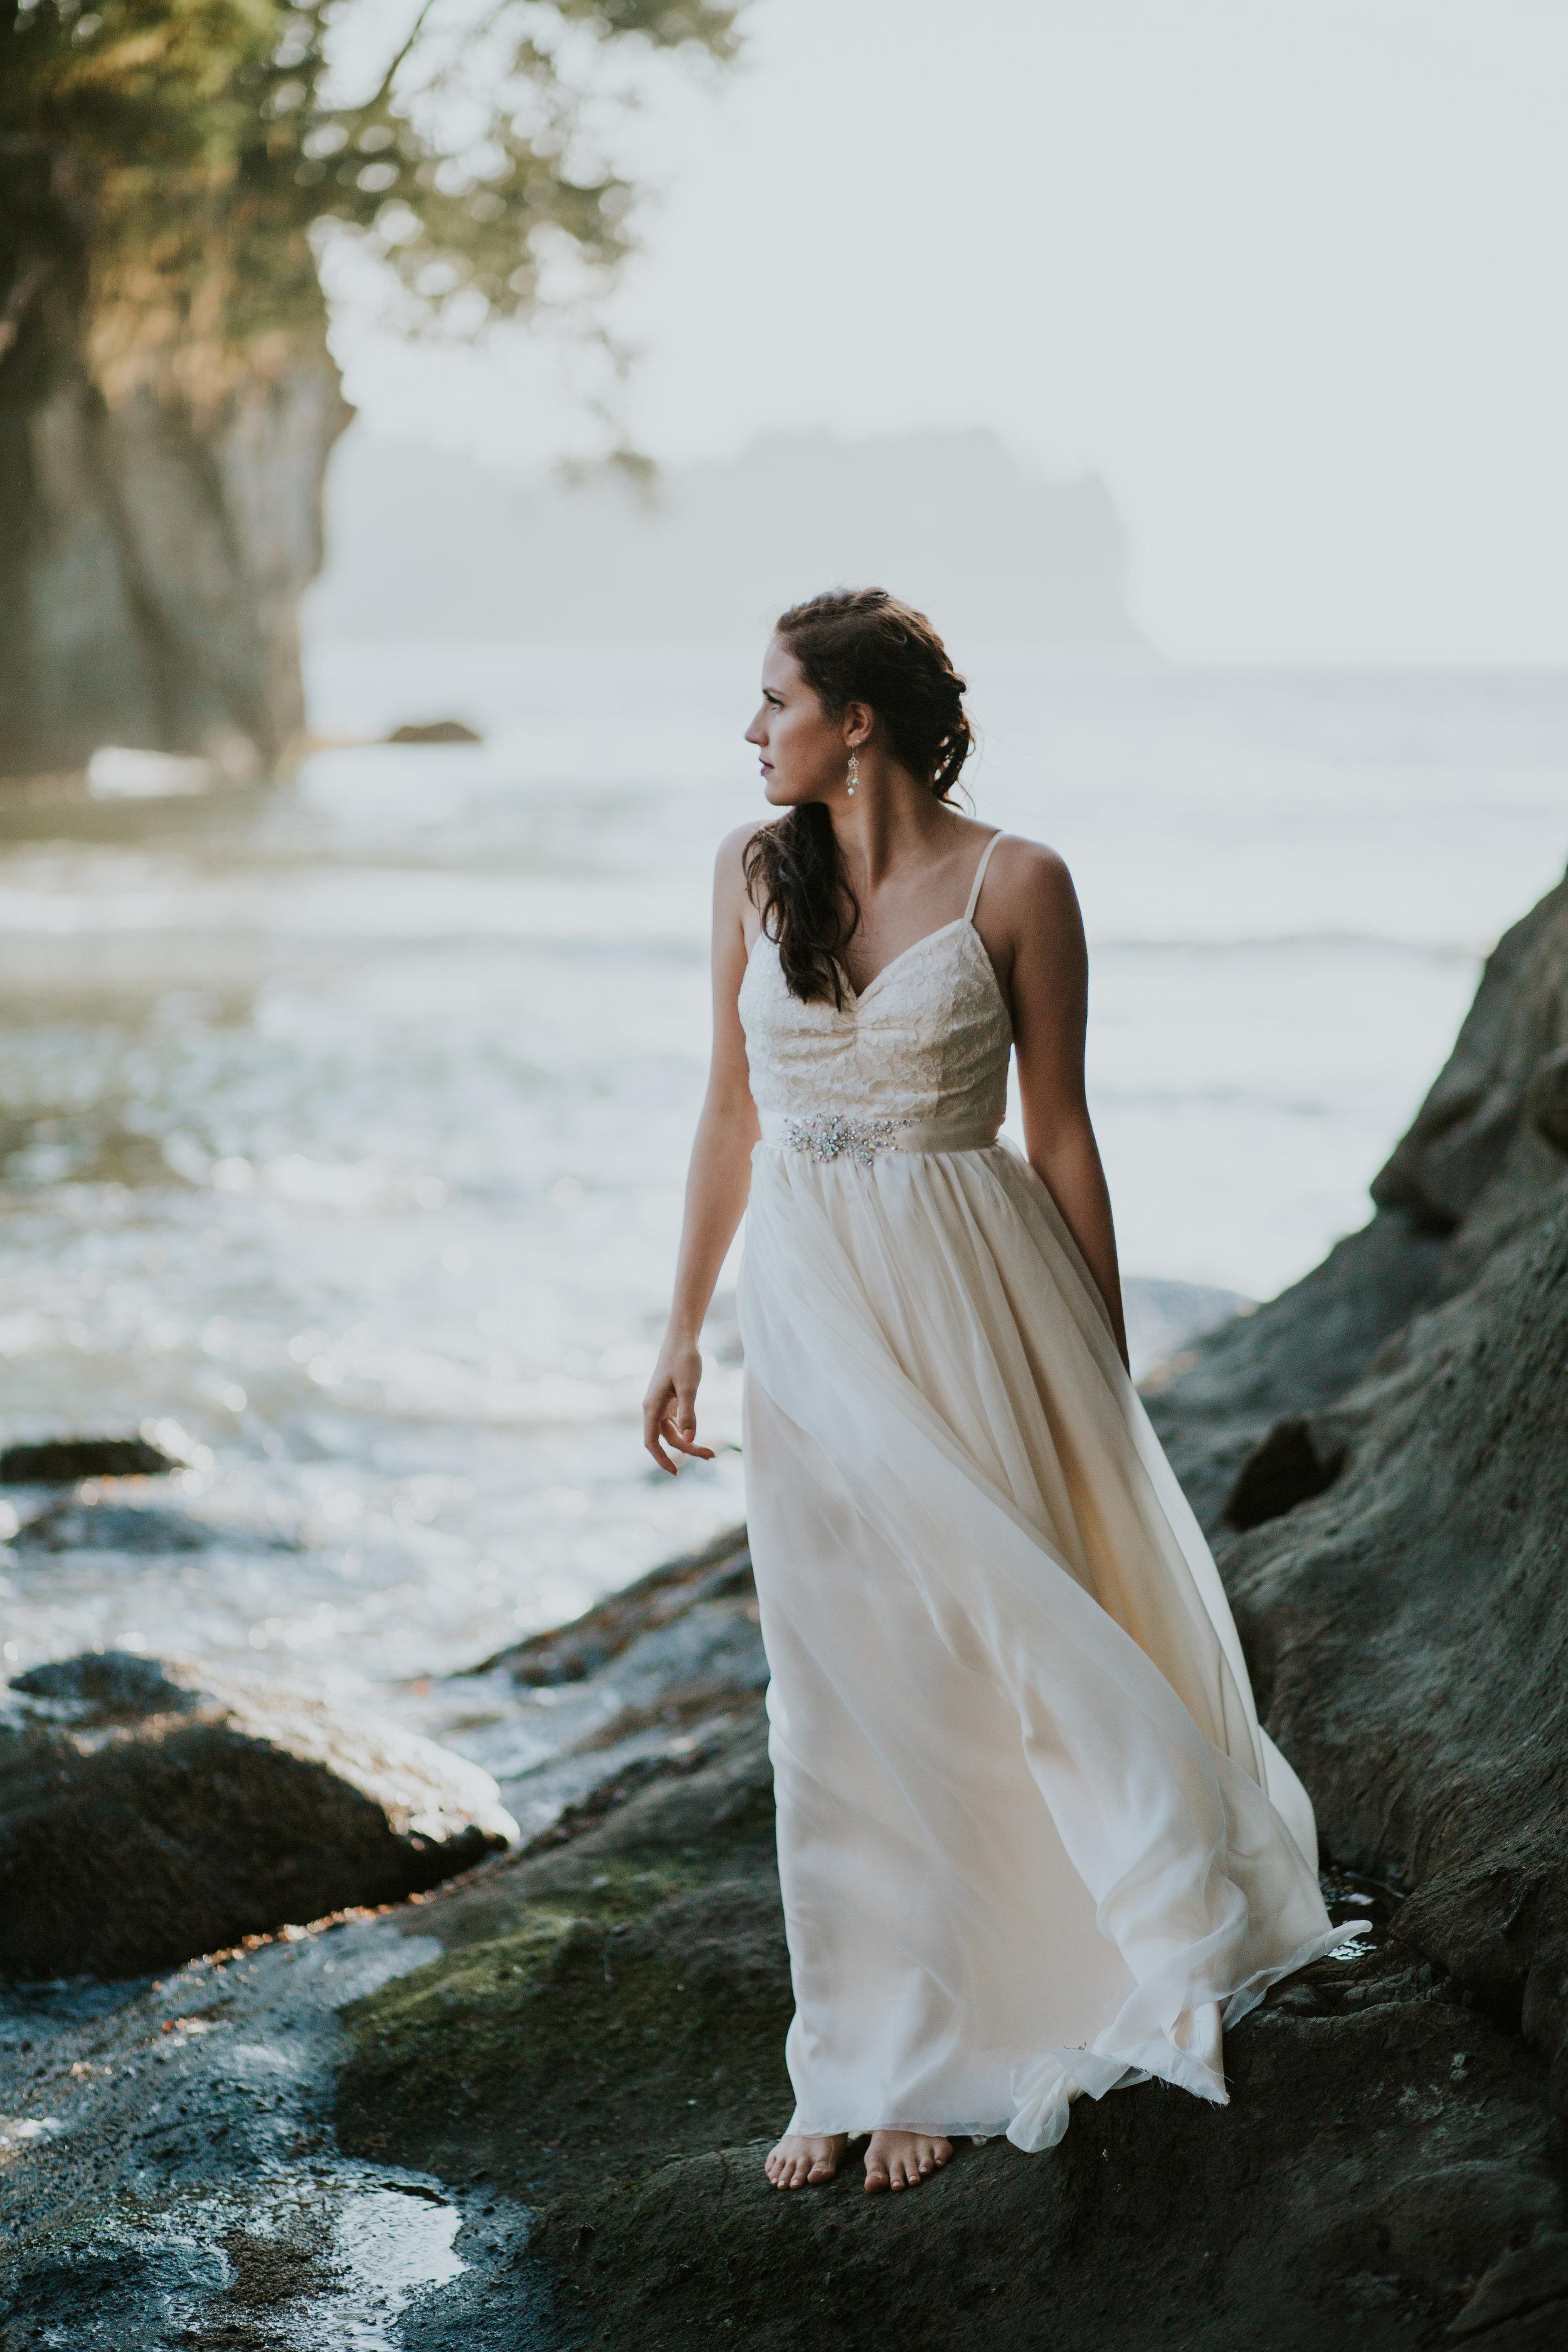 Port-Angeles-Salt-Creek-beach-wedding-bride-PNW-olympic-peninsula-photographer-Kayla-Dawn-Photography-outdoors-golden-hour-dancer-dress (36).jpg